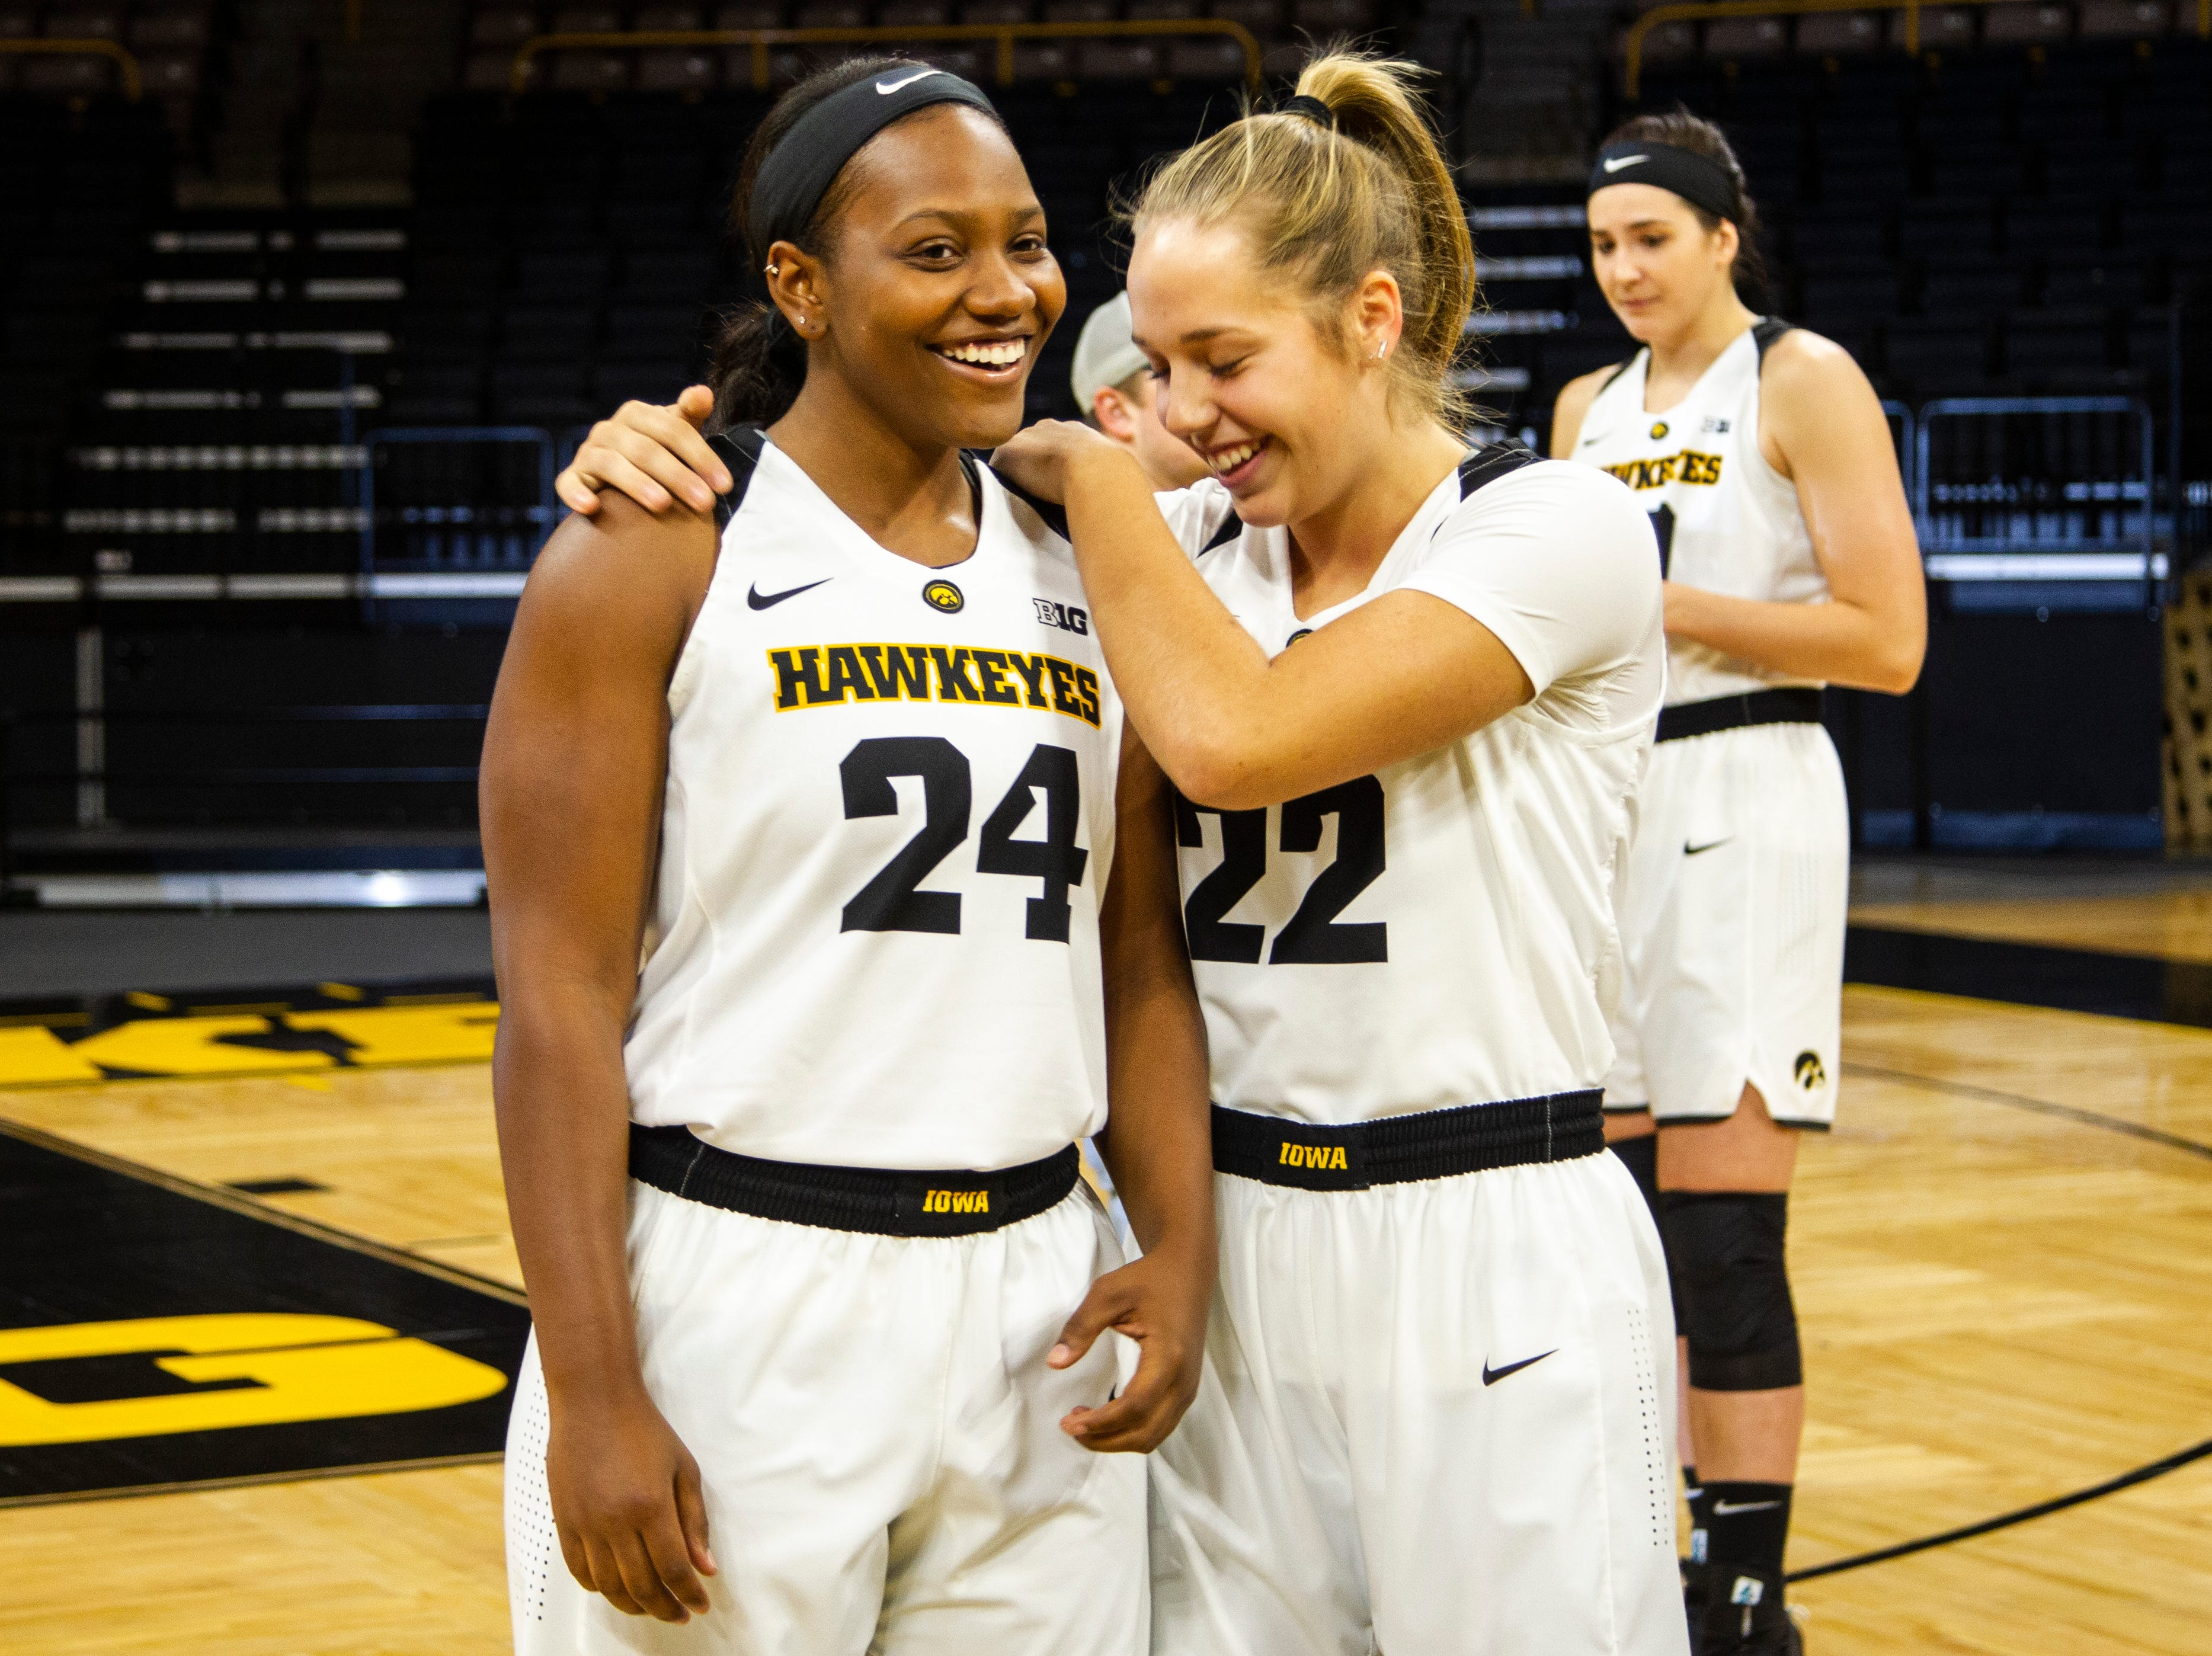 Iowa guard Zion Sanders (24) and Kathleen Doyle (22) joke around during Hawkeye women's basketball media day on Wednesday, Oct. 31, 2018, at Carver-Hawkeye Arena in Iowa City.